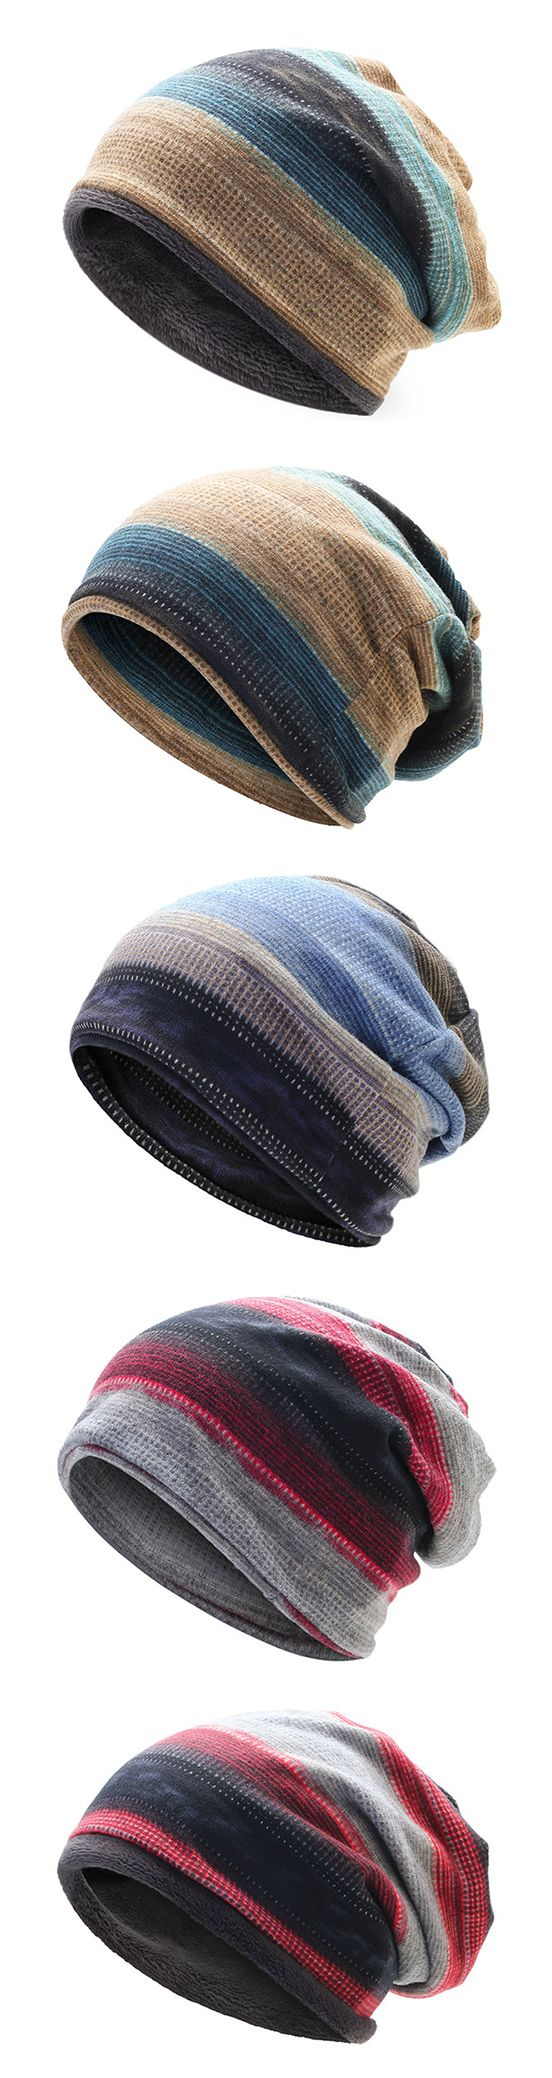 Mens&Women Stripes Beanie Hat #outdoors #fashion #style #art #love